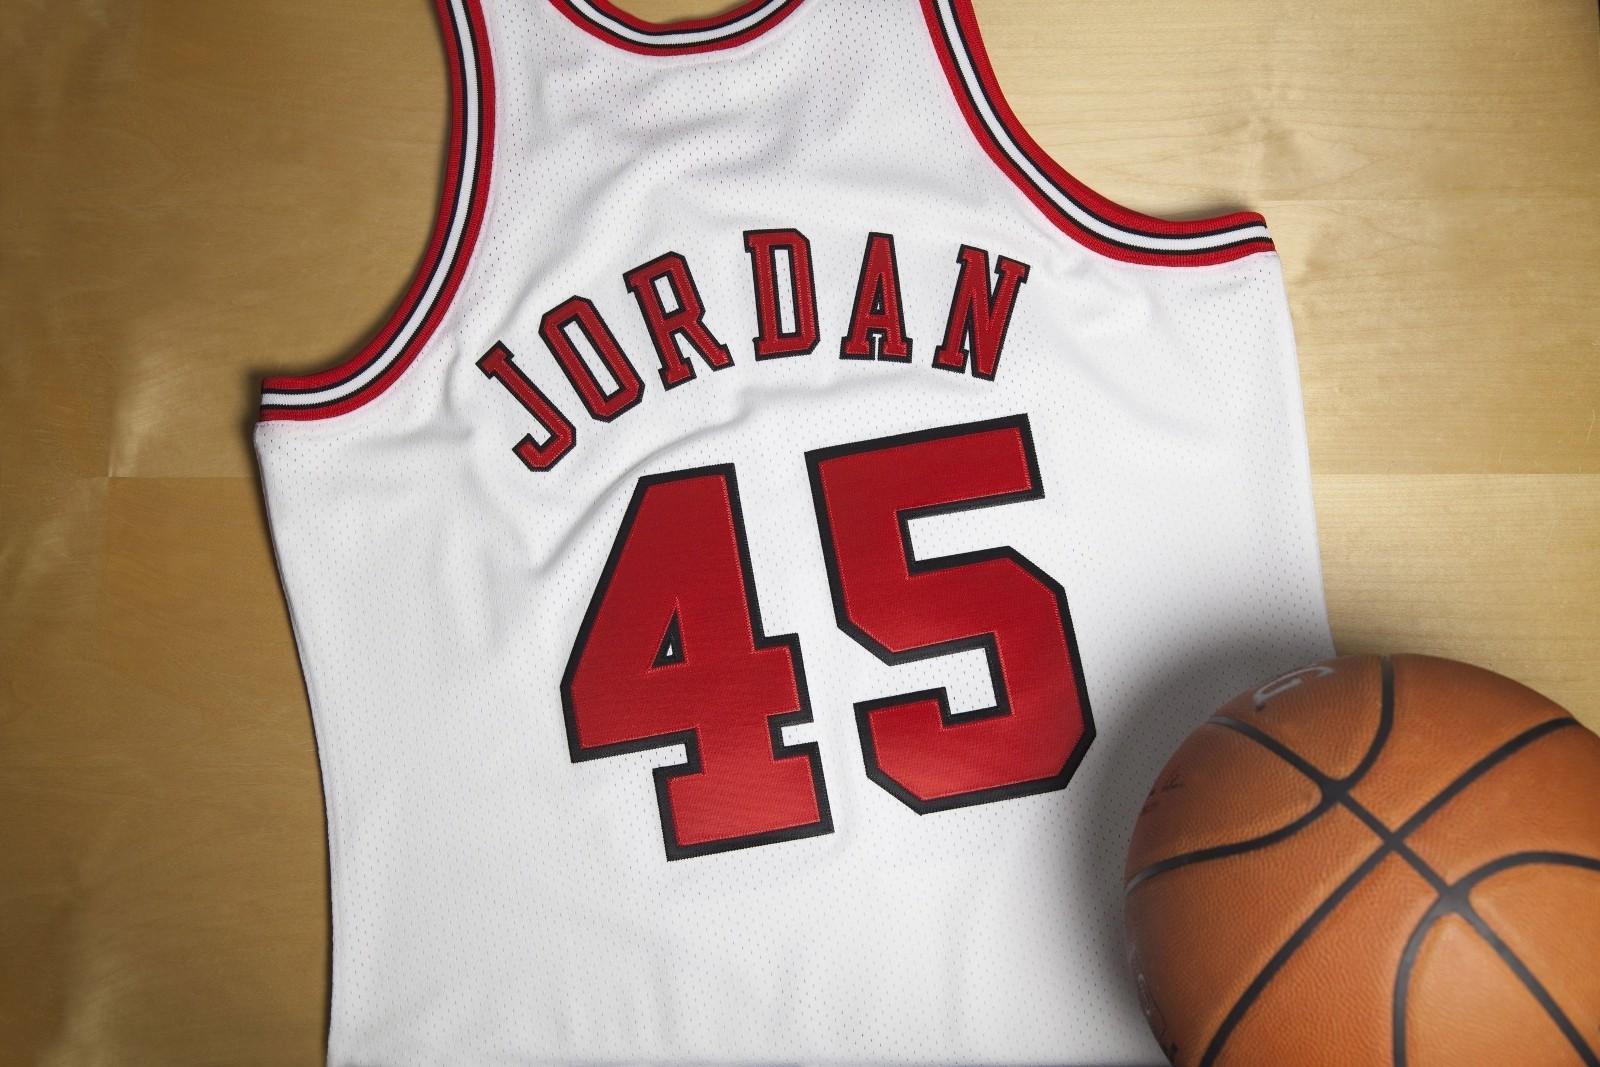 Michael Jordan S No 45 Jersey Unretiring Chicago Tribune